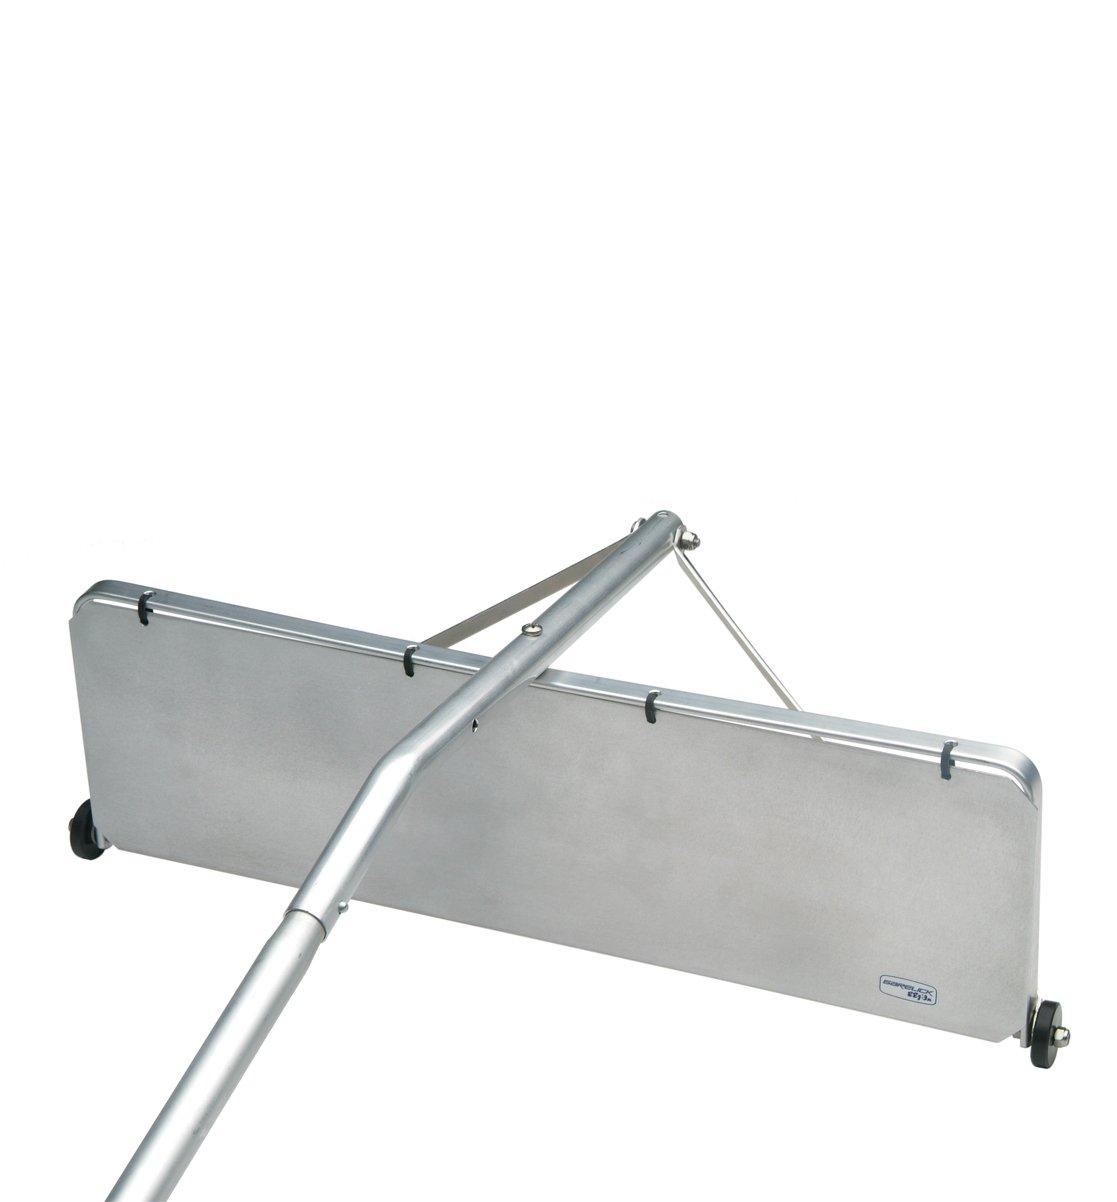 Amazon.com : Garelick 89516 16 Foot Aluminum Snow Trap Roof Rake With  7 Inch By 24 Inch Blade : Garden U0026 Outdoor